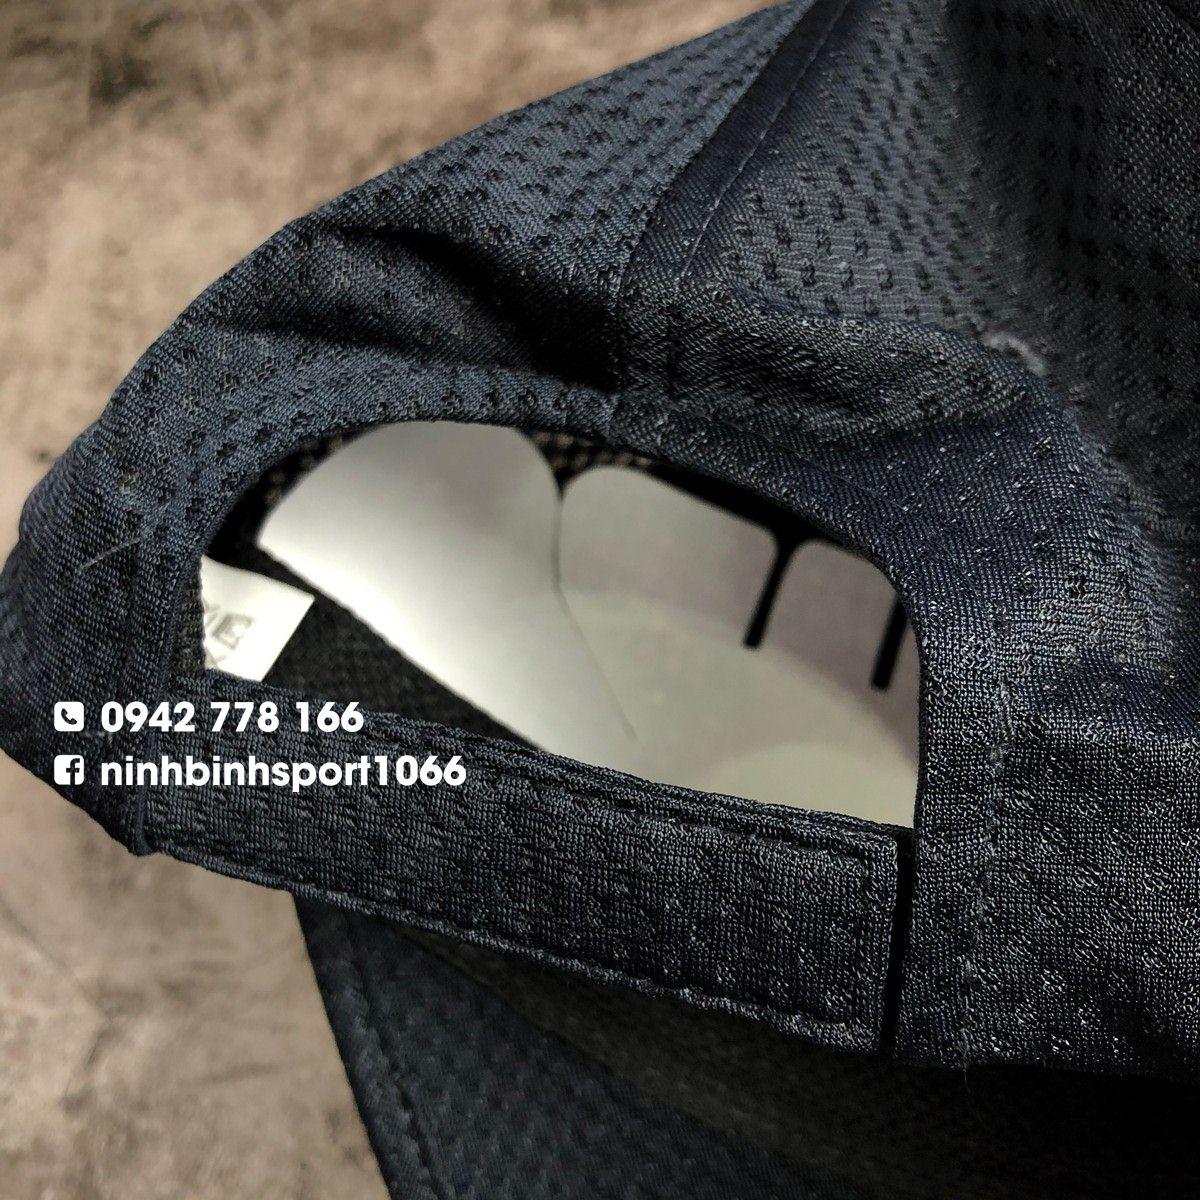 Mũ thể thao Adidas 517-71-OSFX